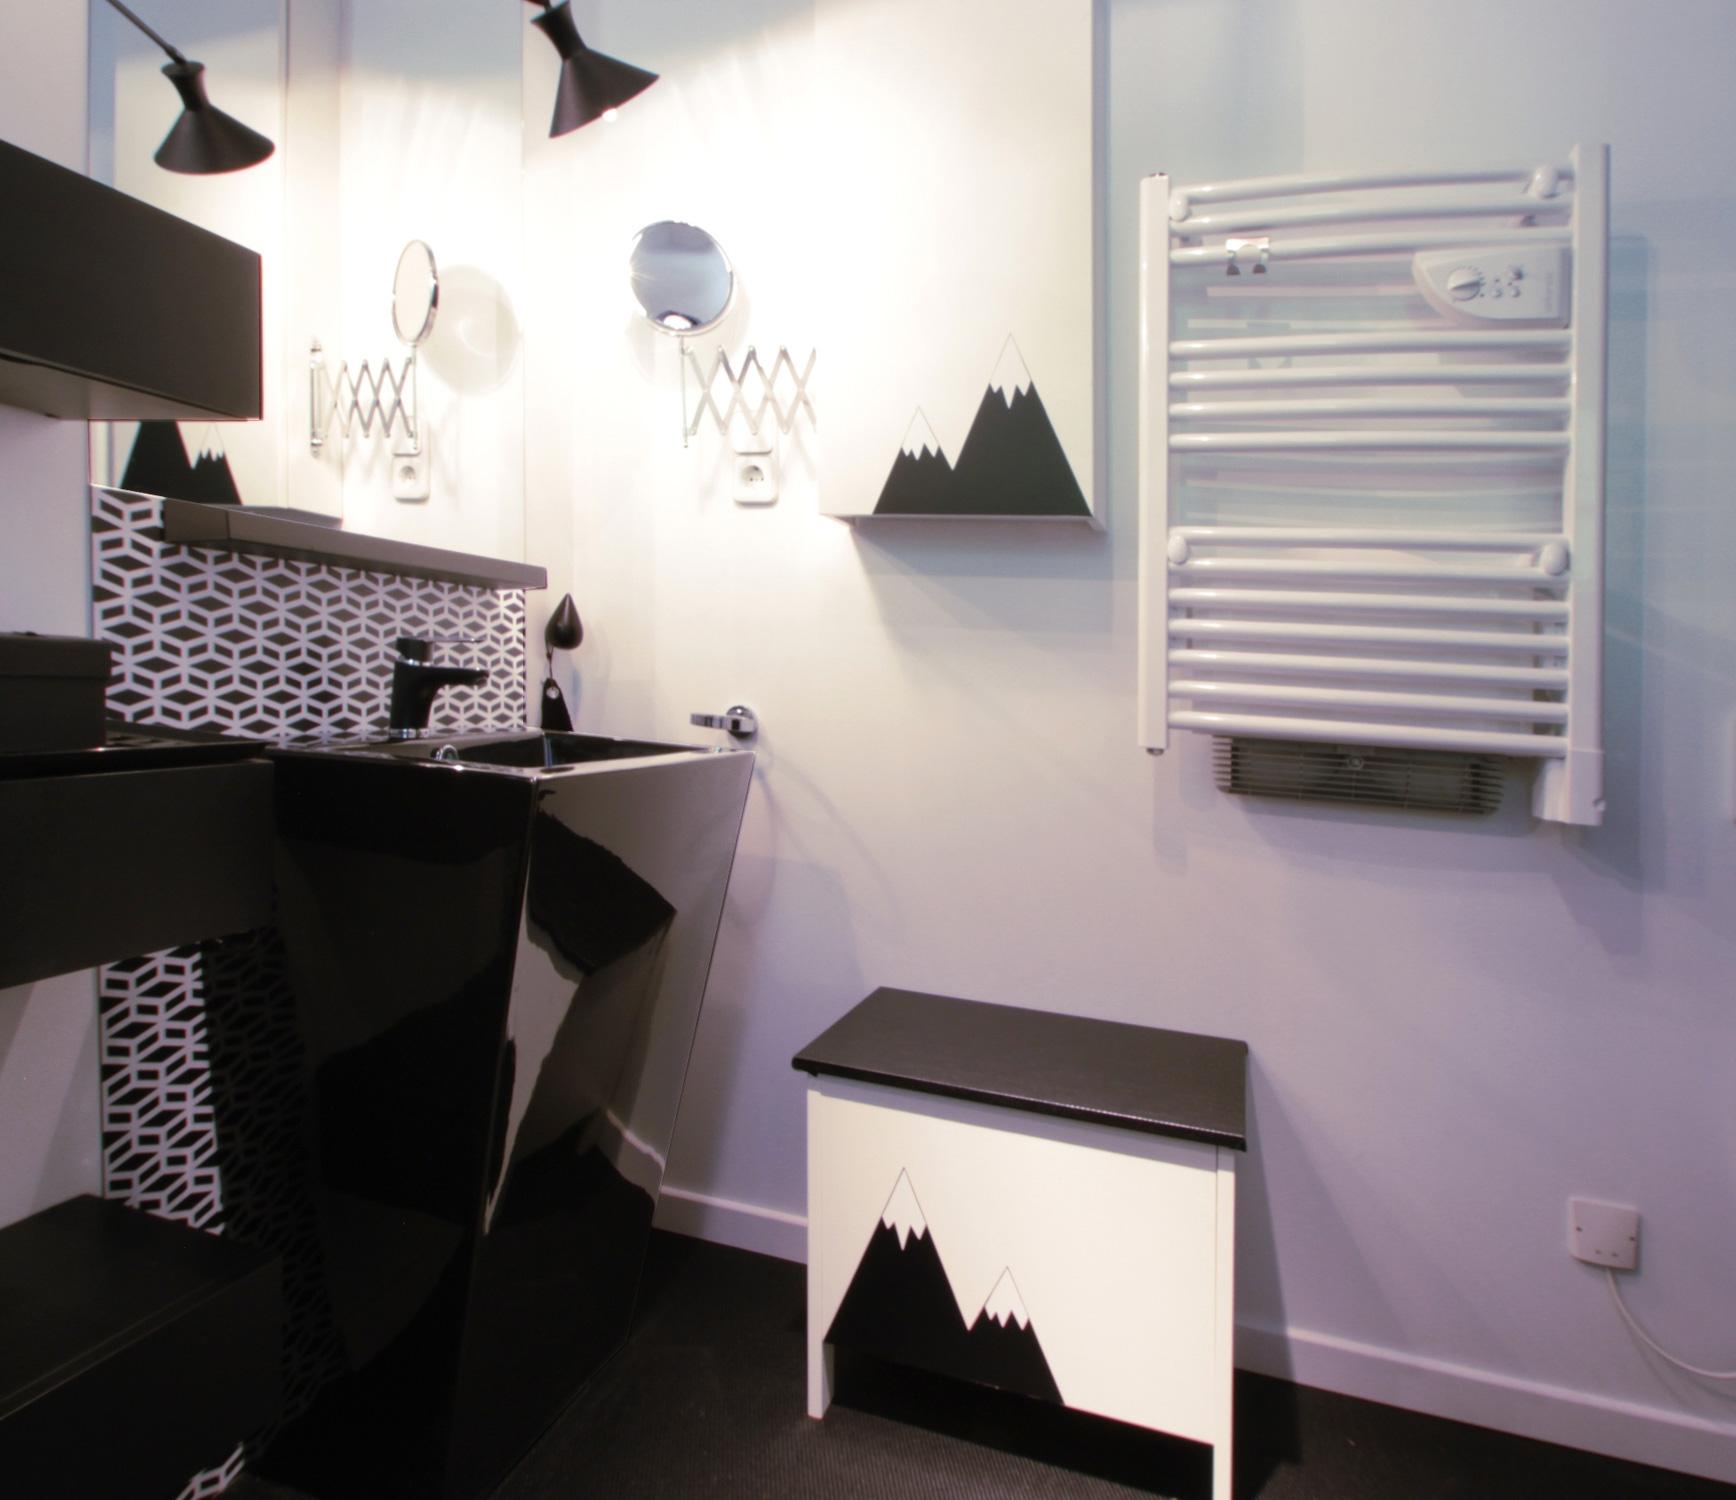 Deco 1 meuble rangement sdb malo design for Enseigne salle de bain